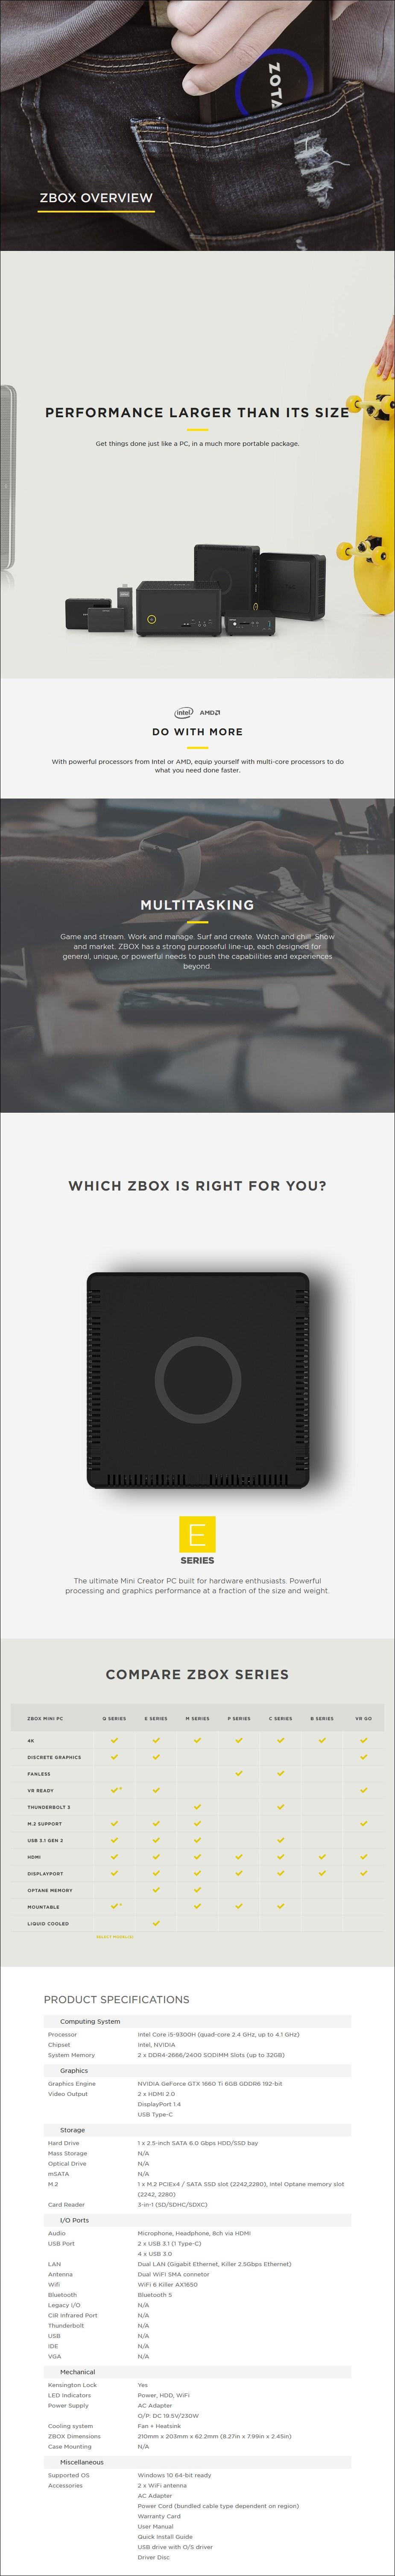 Zotac ZBOX EN51660T Barebone Mini PC - i5-9300H GTX1660Ti WiFi BT - Overview 1